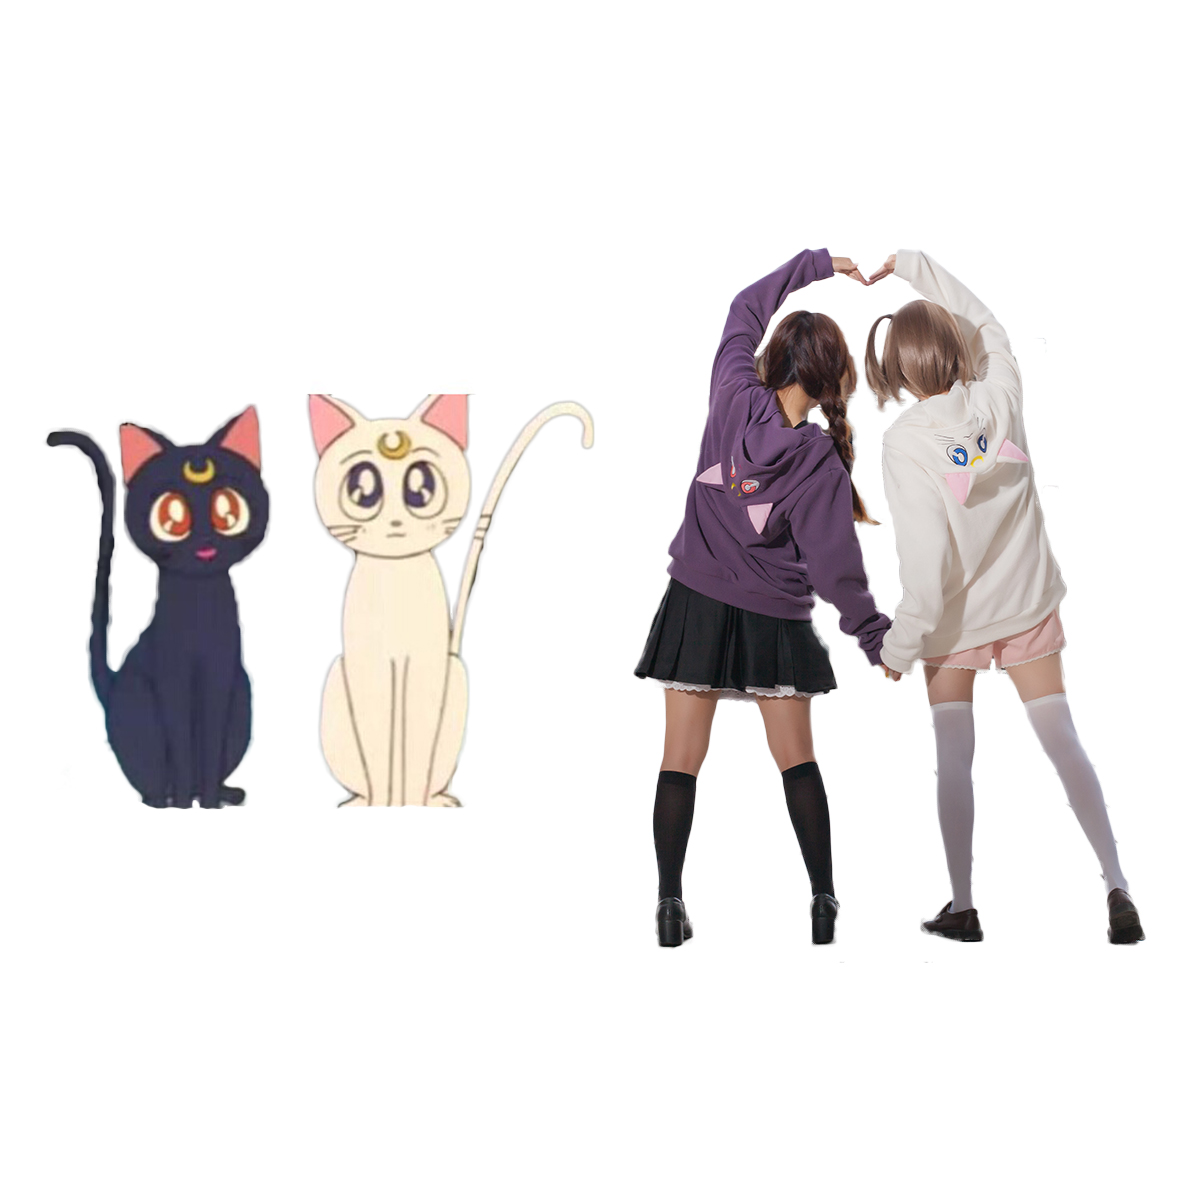 Sailor Moon Luna Cosplay Costumes Deluxe Edition